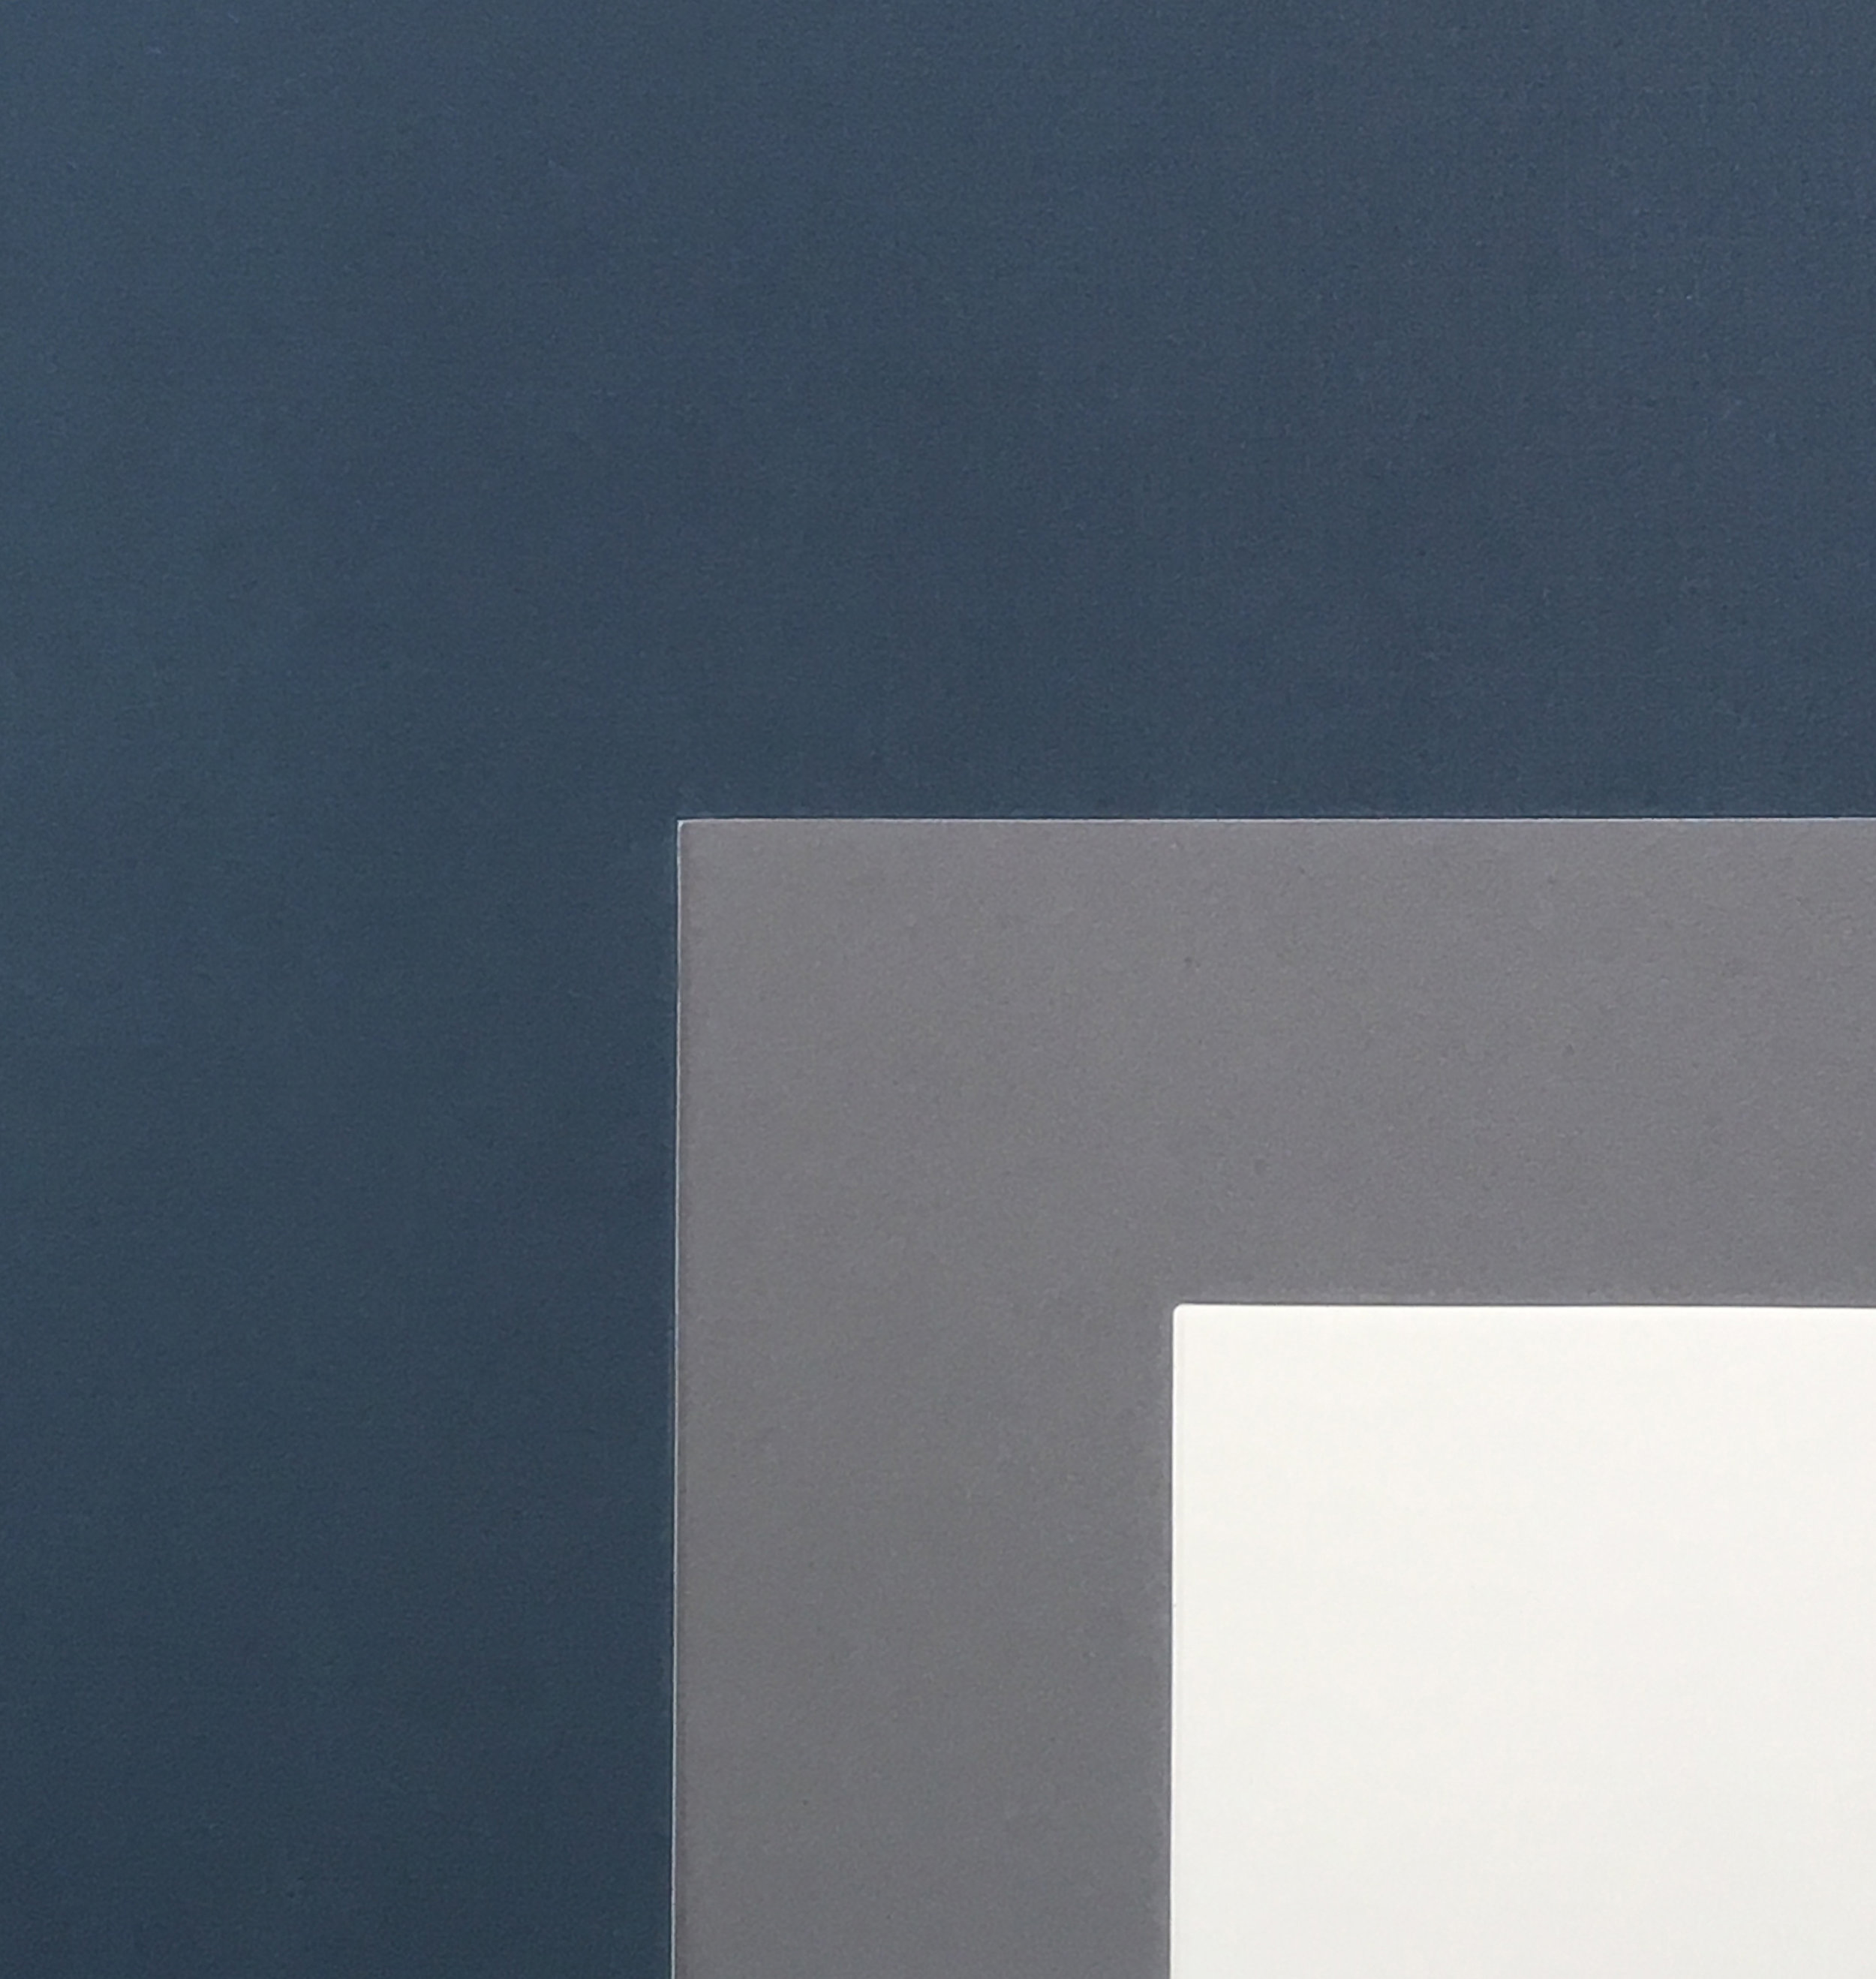 Blue_edit.jpg